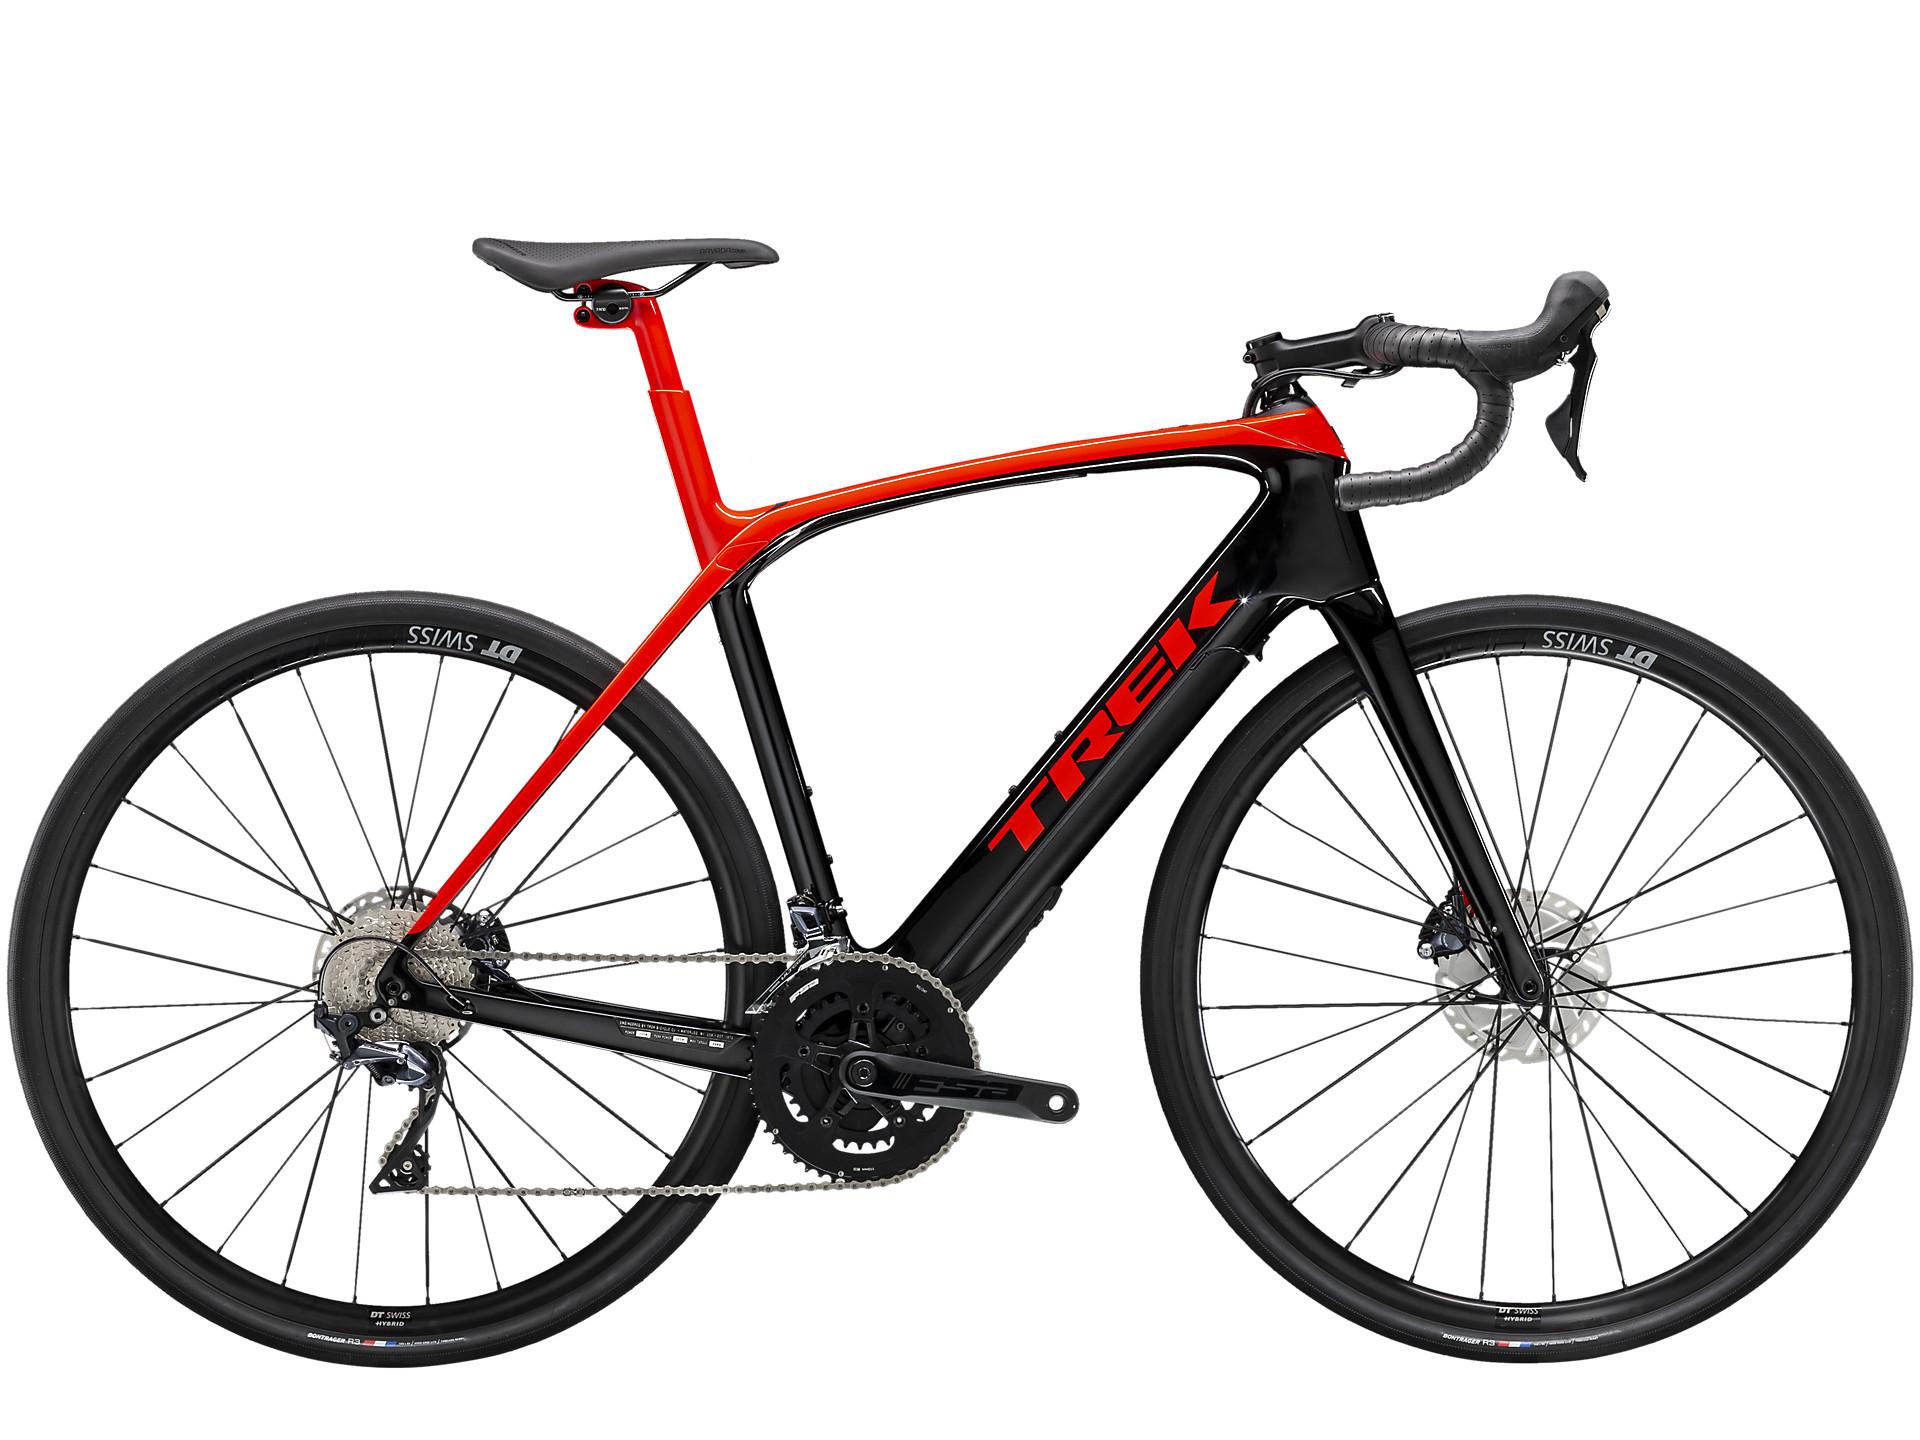 Domane+ LT men's road bike electric